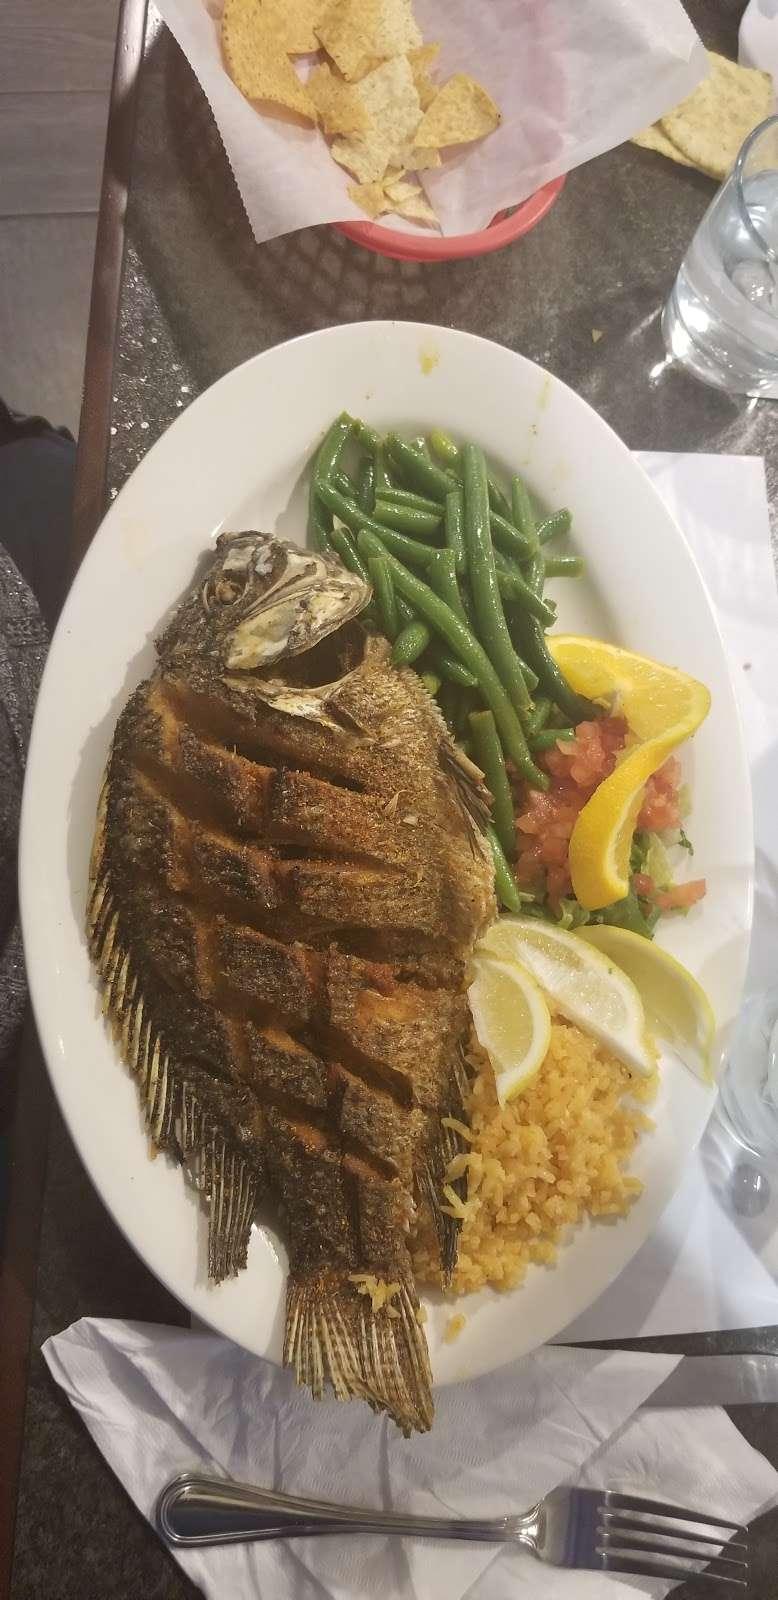 El Chivolin Restaurant - restaurant  | Photo 5 of 10 | Address: 4171 S 76th St, Greenfield, WI 53220, USA | Phone: (414) 810-0482